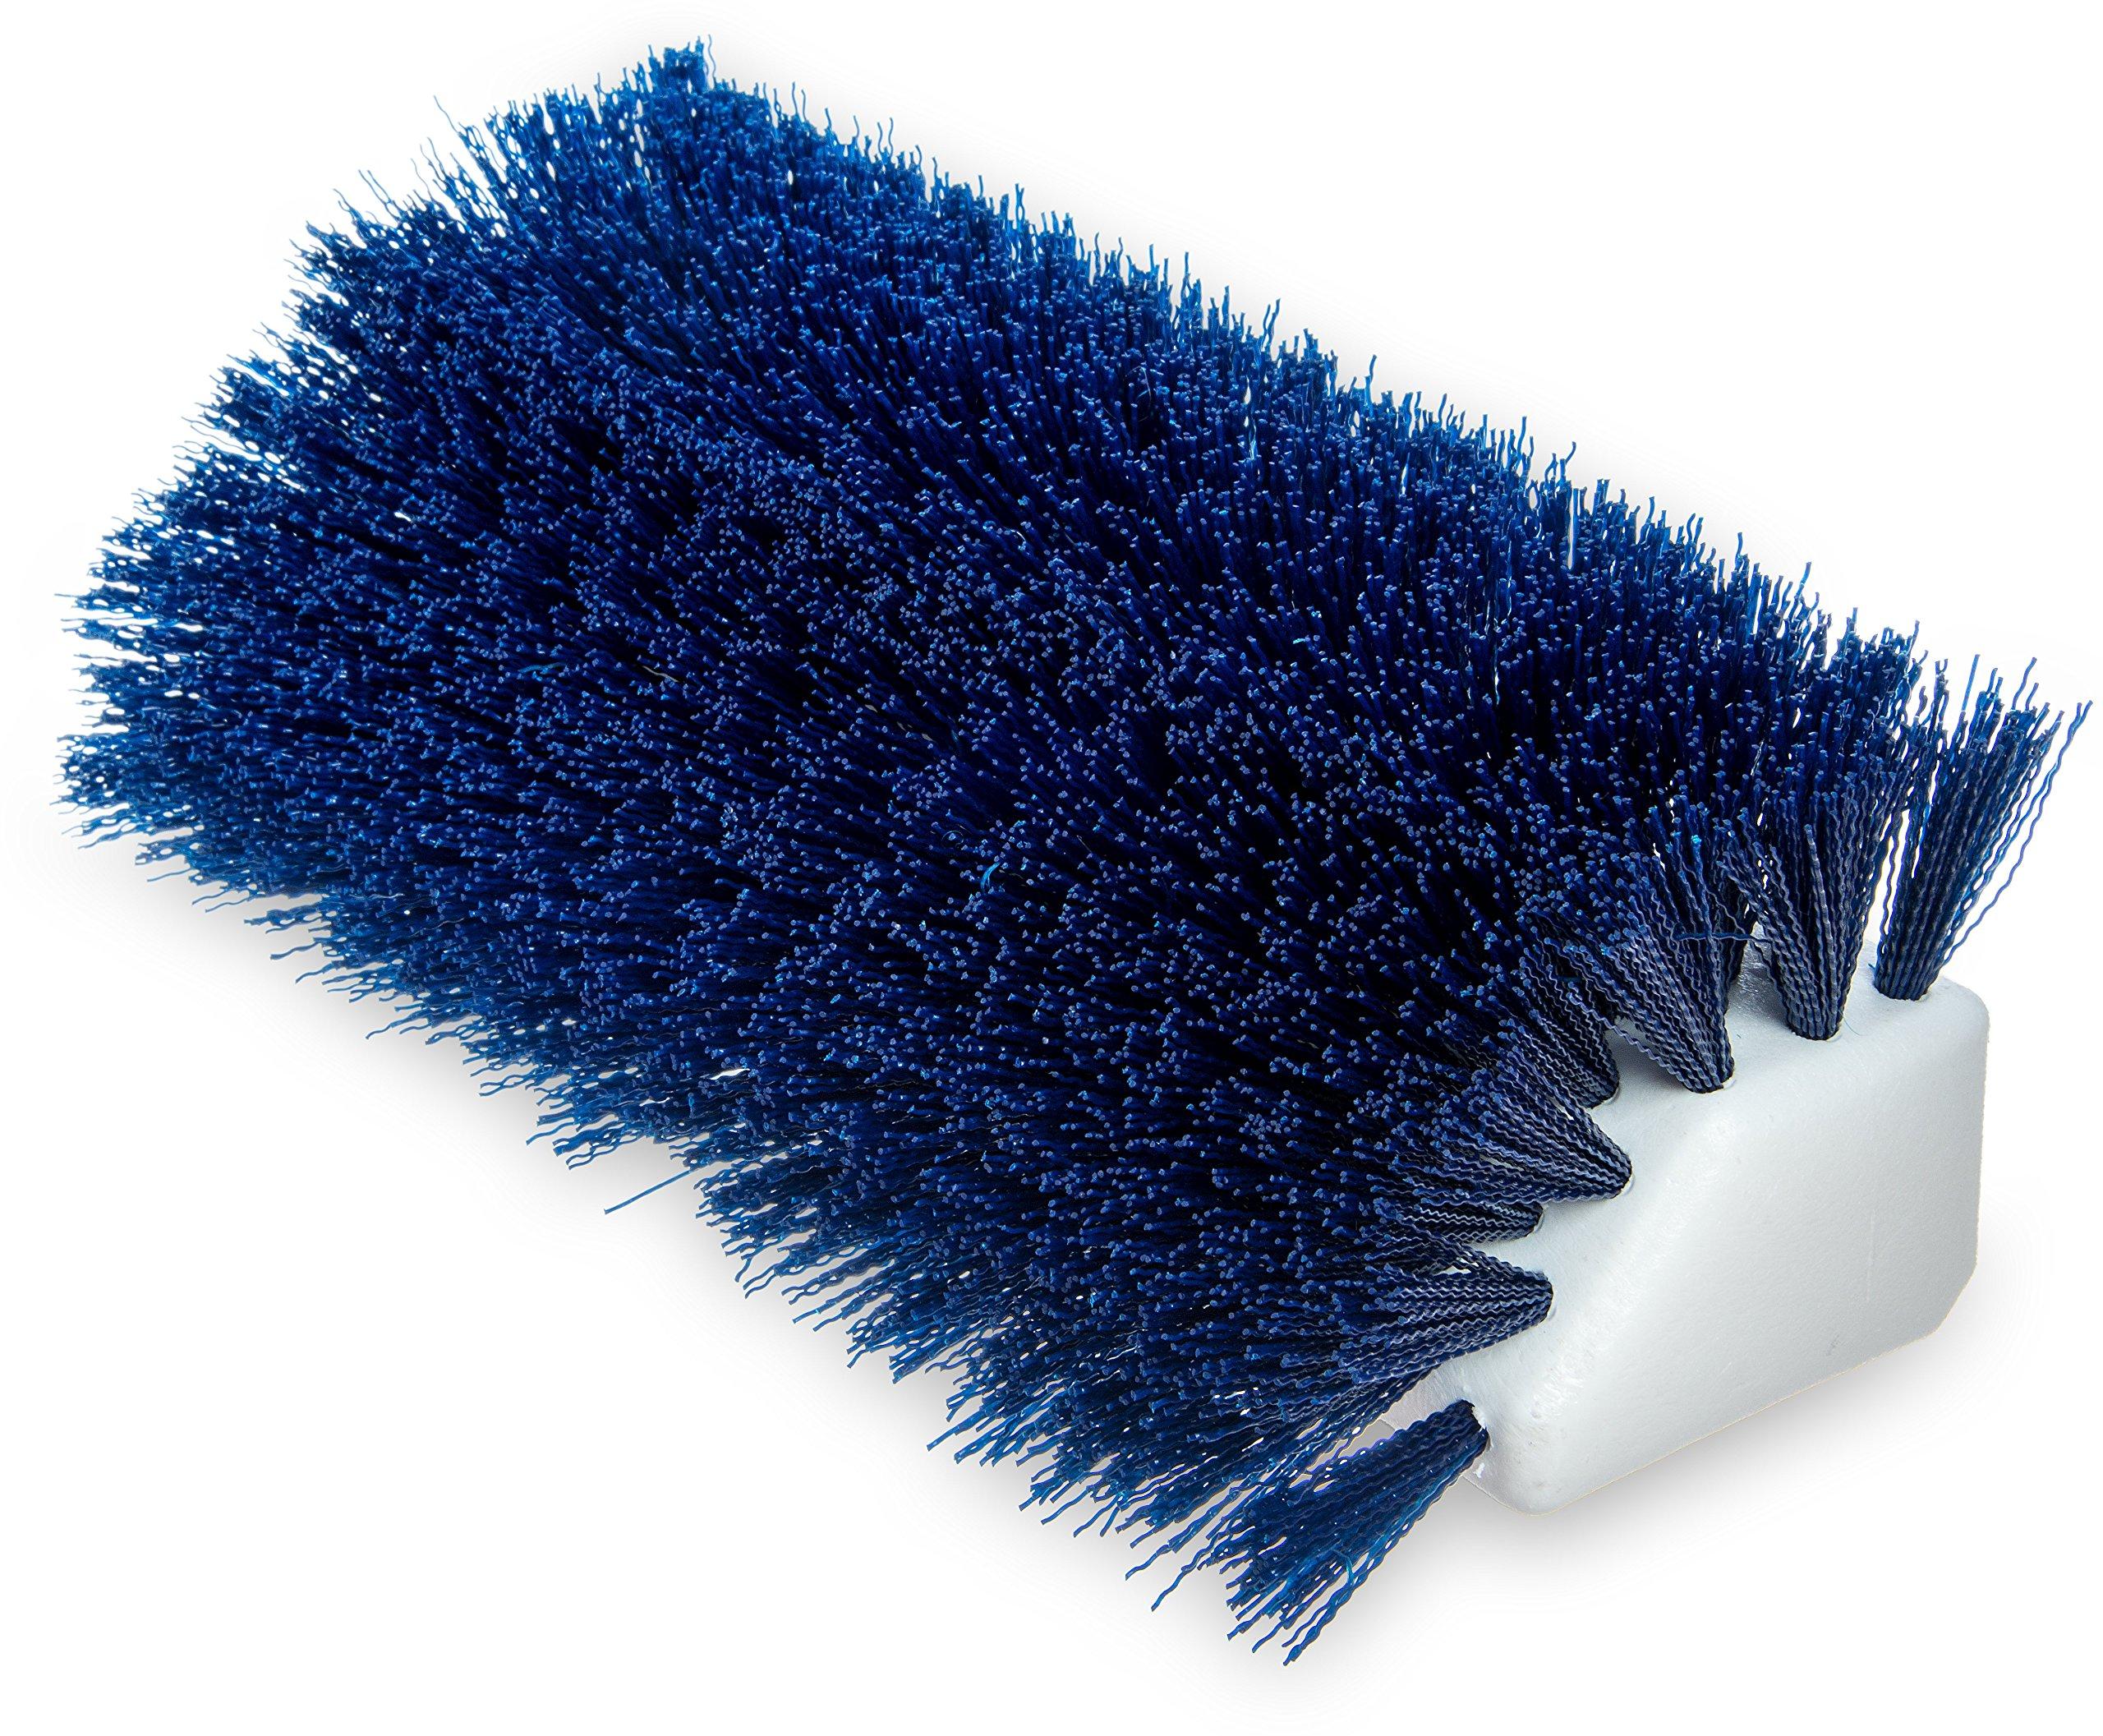 Carlisle 4042314 Hi-Lo Floor Scrub Brush, Blue (Pack of 12)